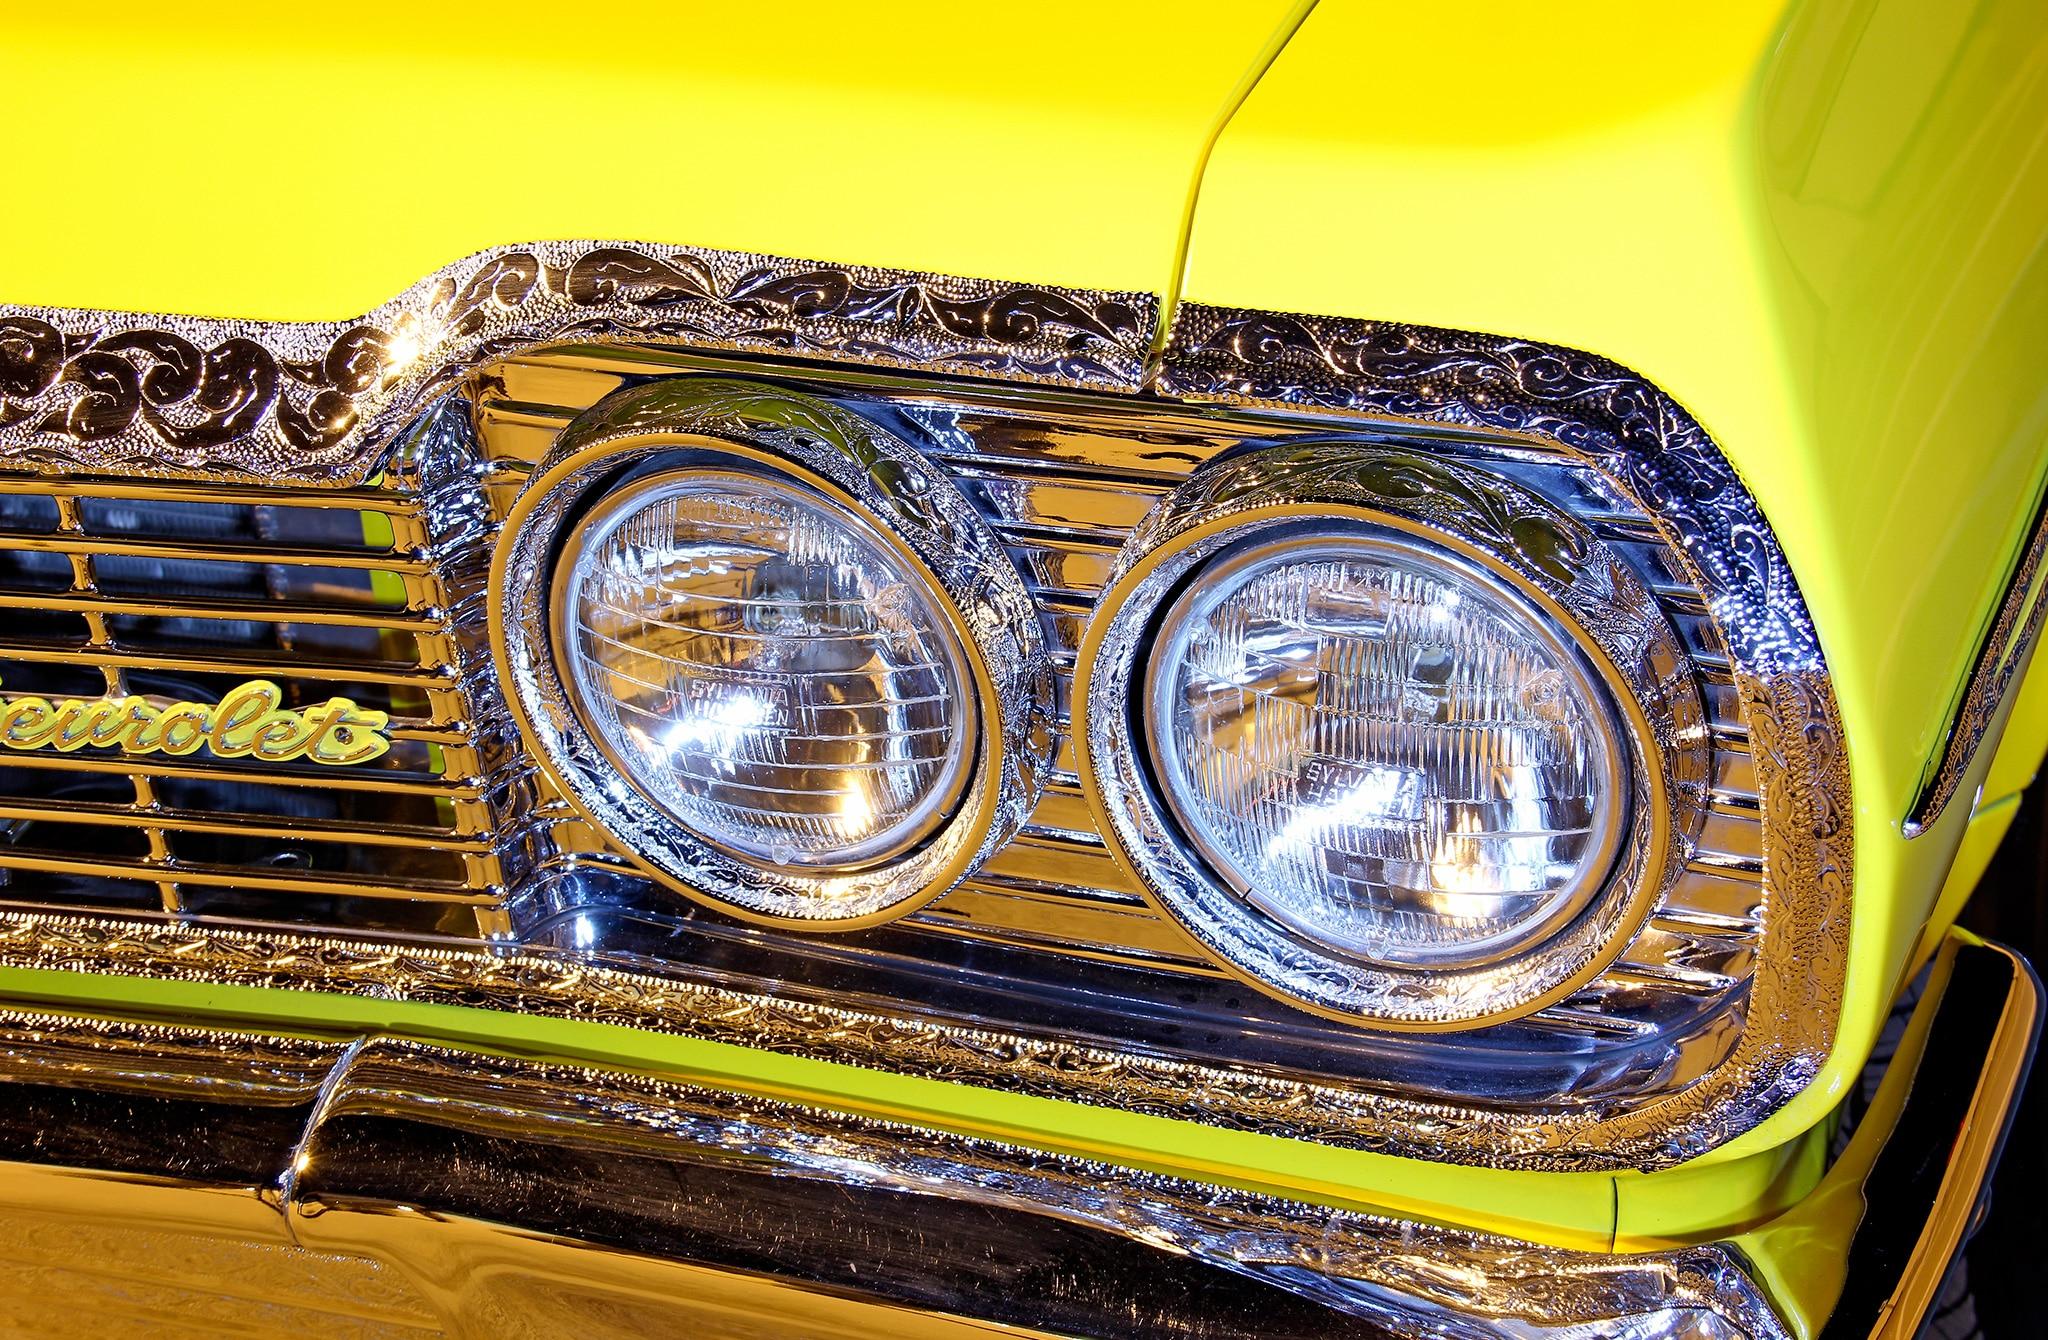 64 Impala Convertible >> 1964 Chevrolet Impala Convertible - Canadian Convertible